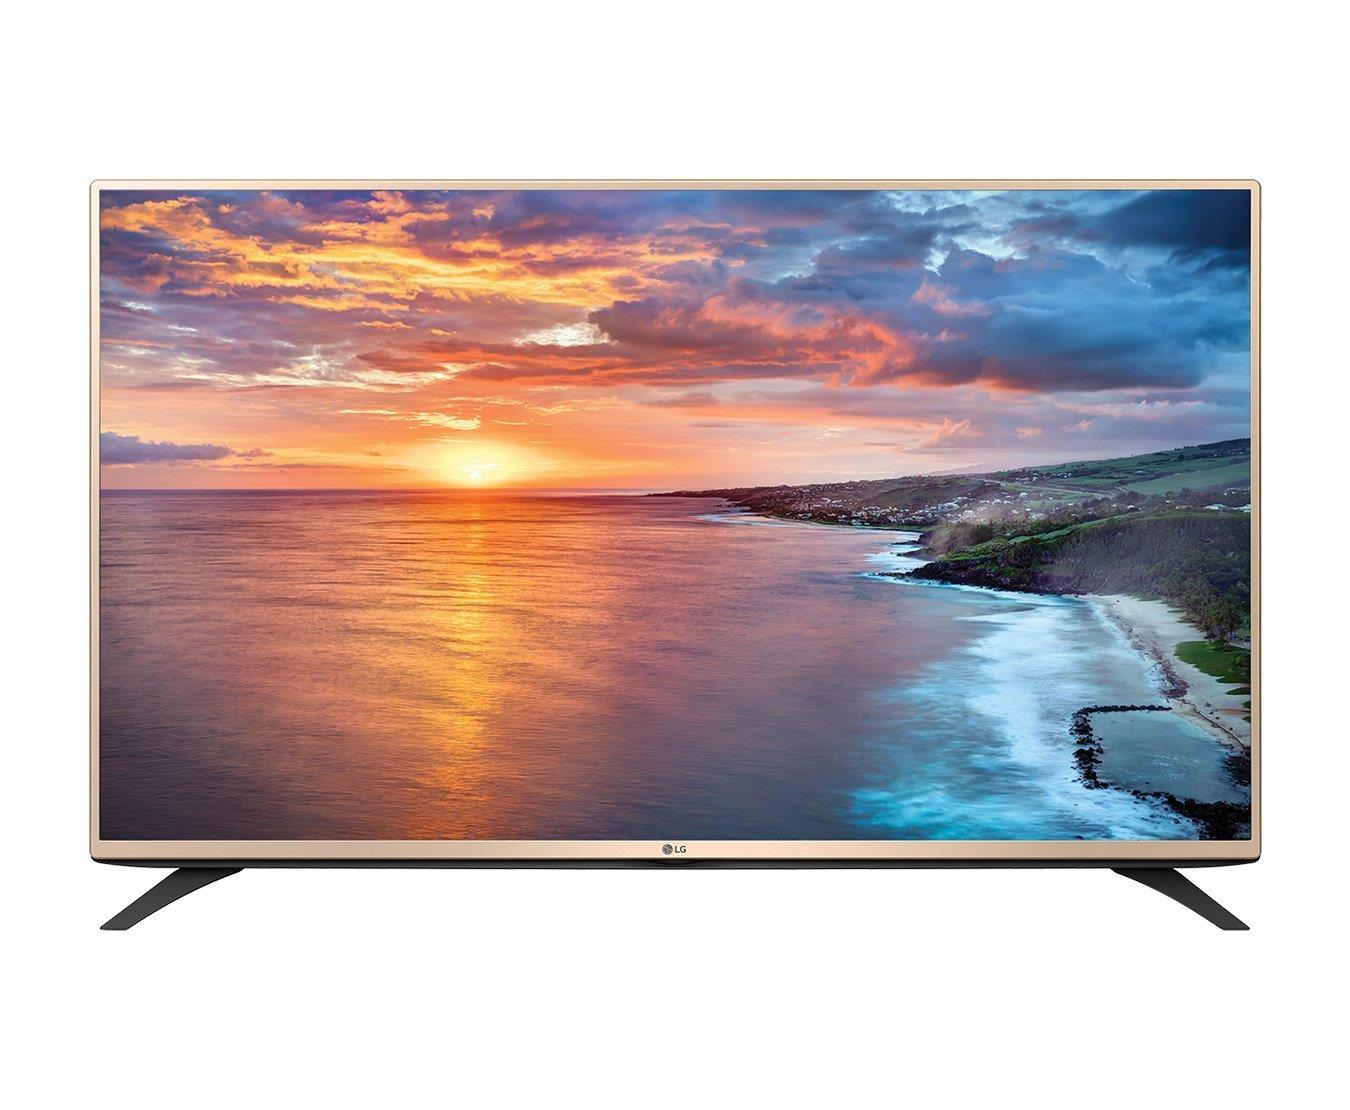 lg 49uf670t 123 cm 49 led tv ultra hd 4k photos images and wallpapers. Black Bedroom Furniture Sets. Home Design Ideas